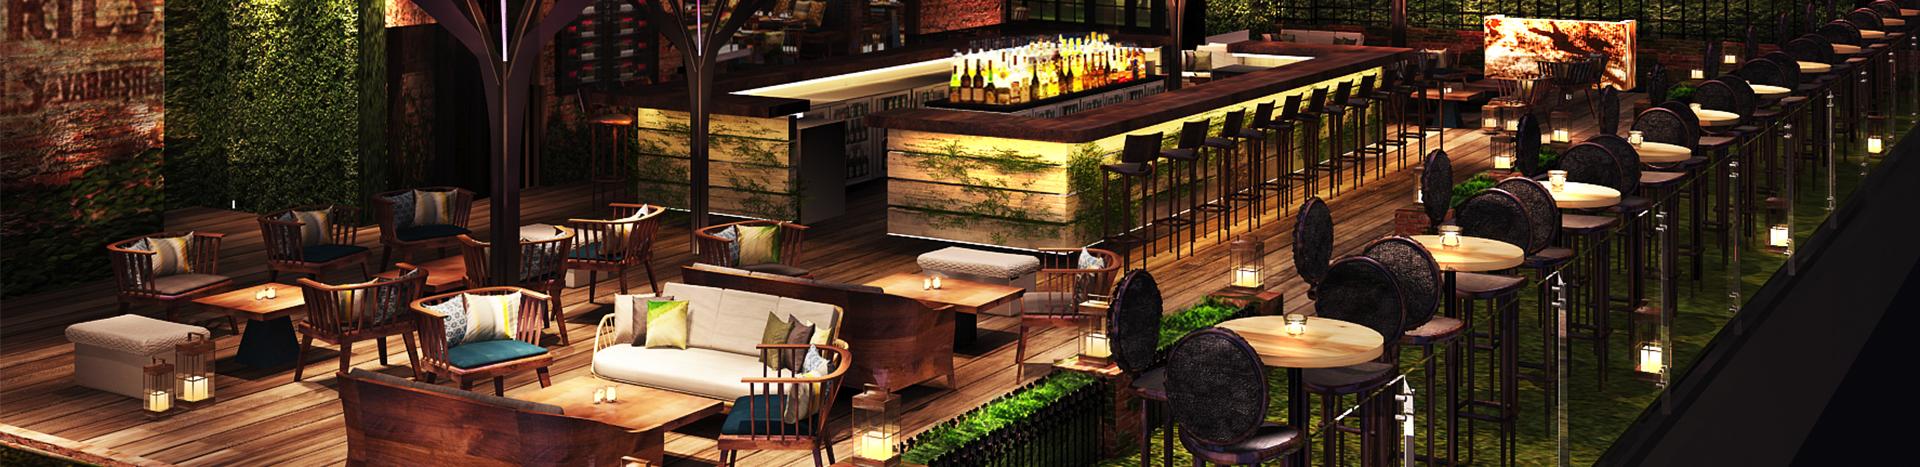 above-eleven-bali-hotel-build-in-design-indonesia-sohohospitality